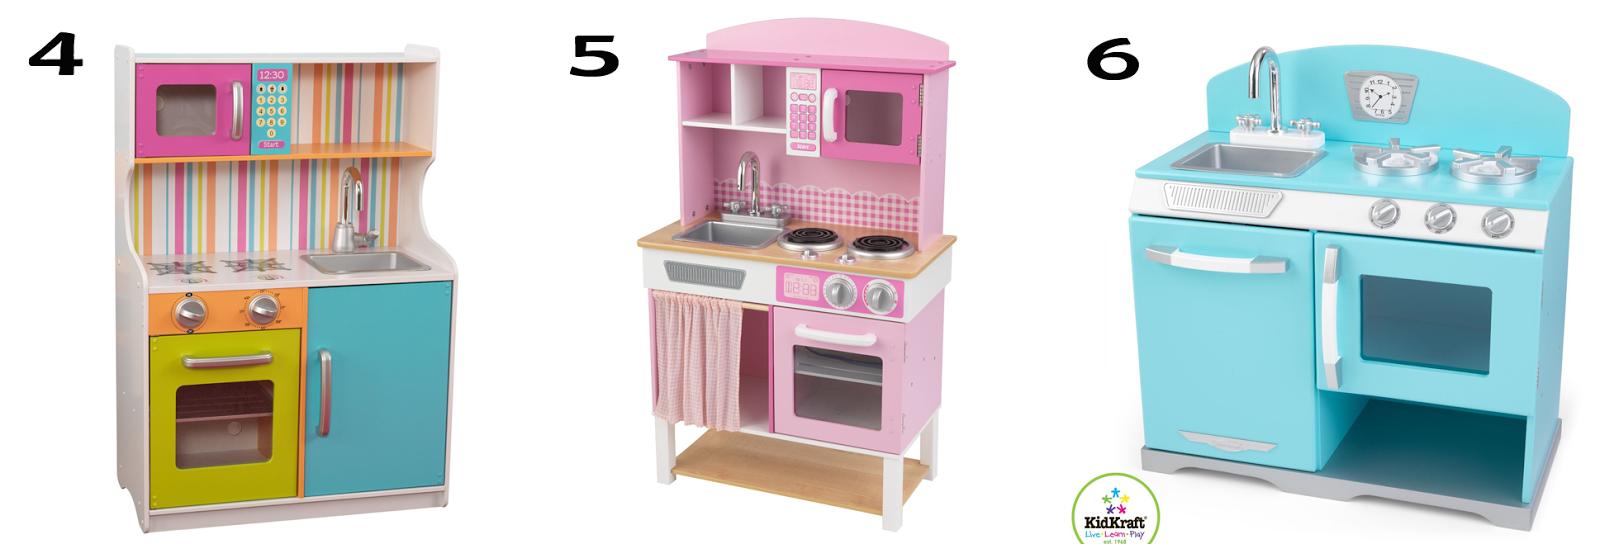 Kidkraft Küche Retro Rosa